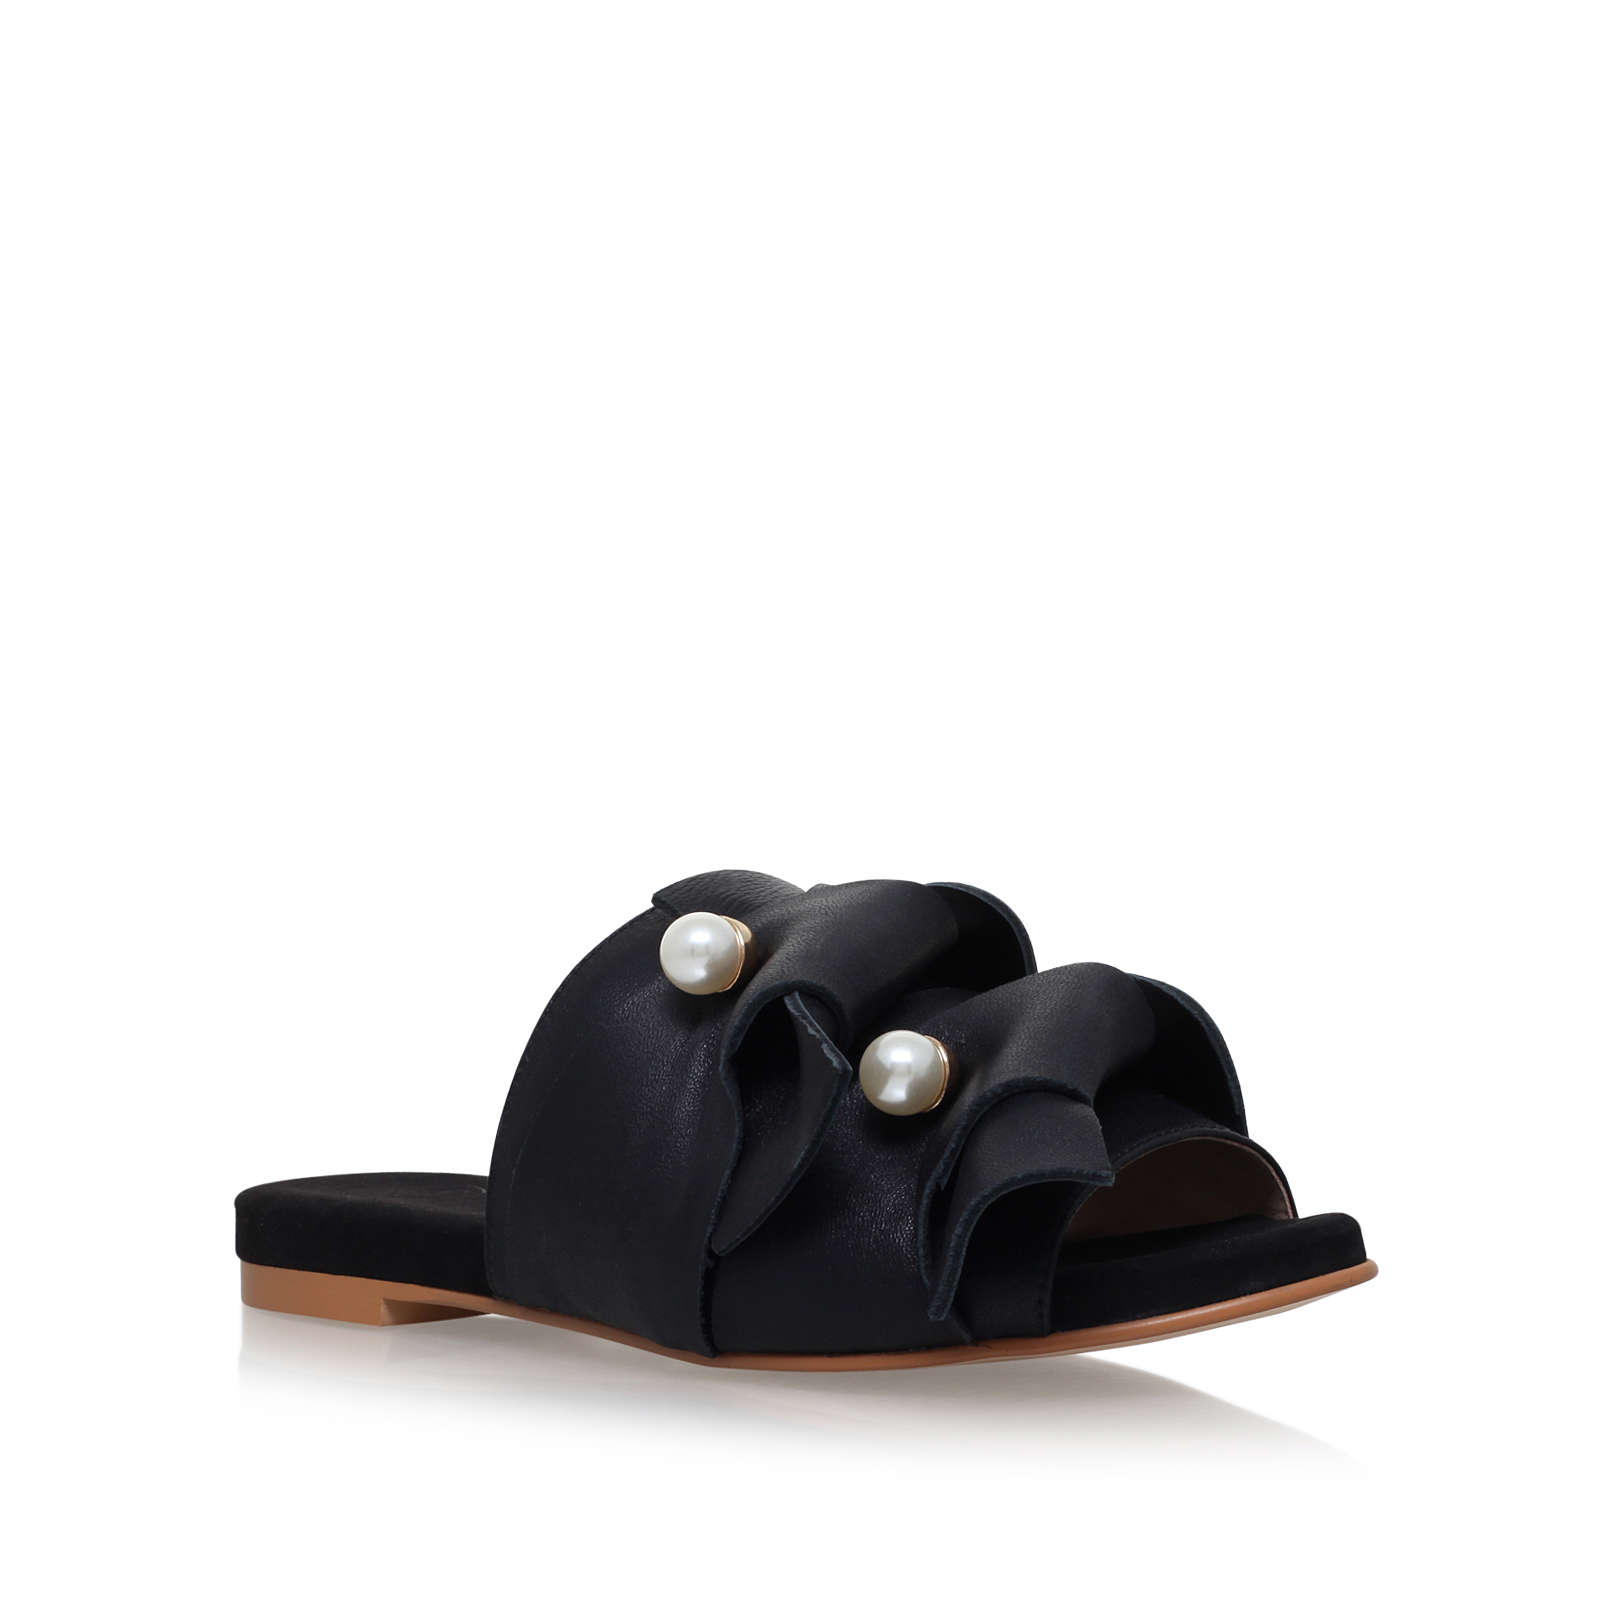 7b9c40b9655 NAOMI kg kurt geiger naomi black leather slider flat sandal by KG ...